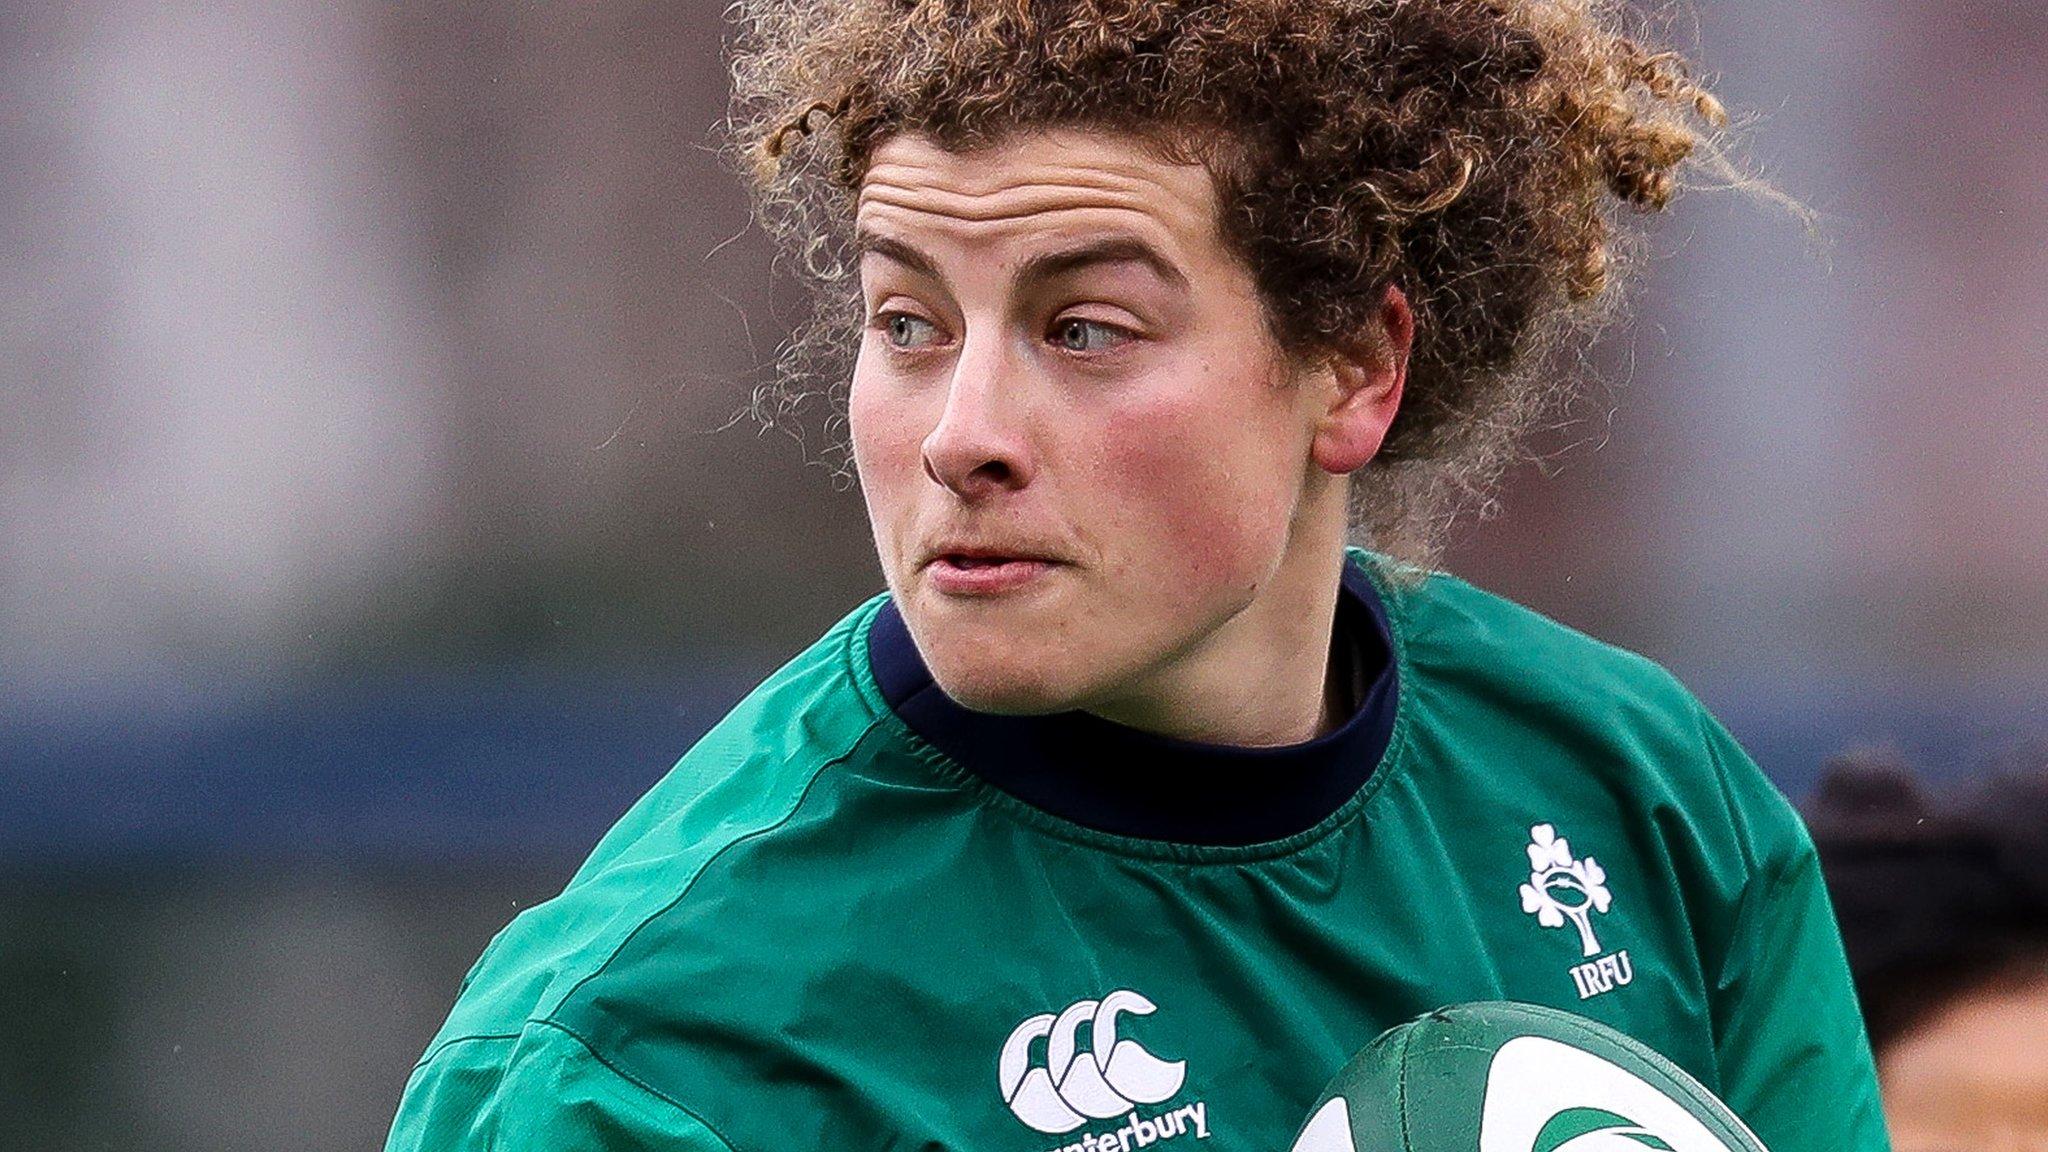 Irish RFU apologises for confusion over part-time women's XVs coach